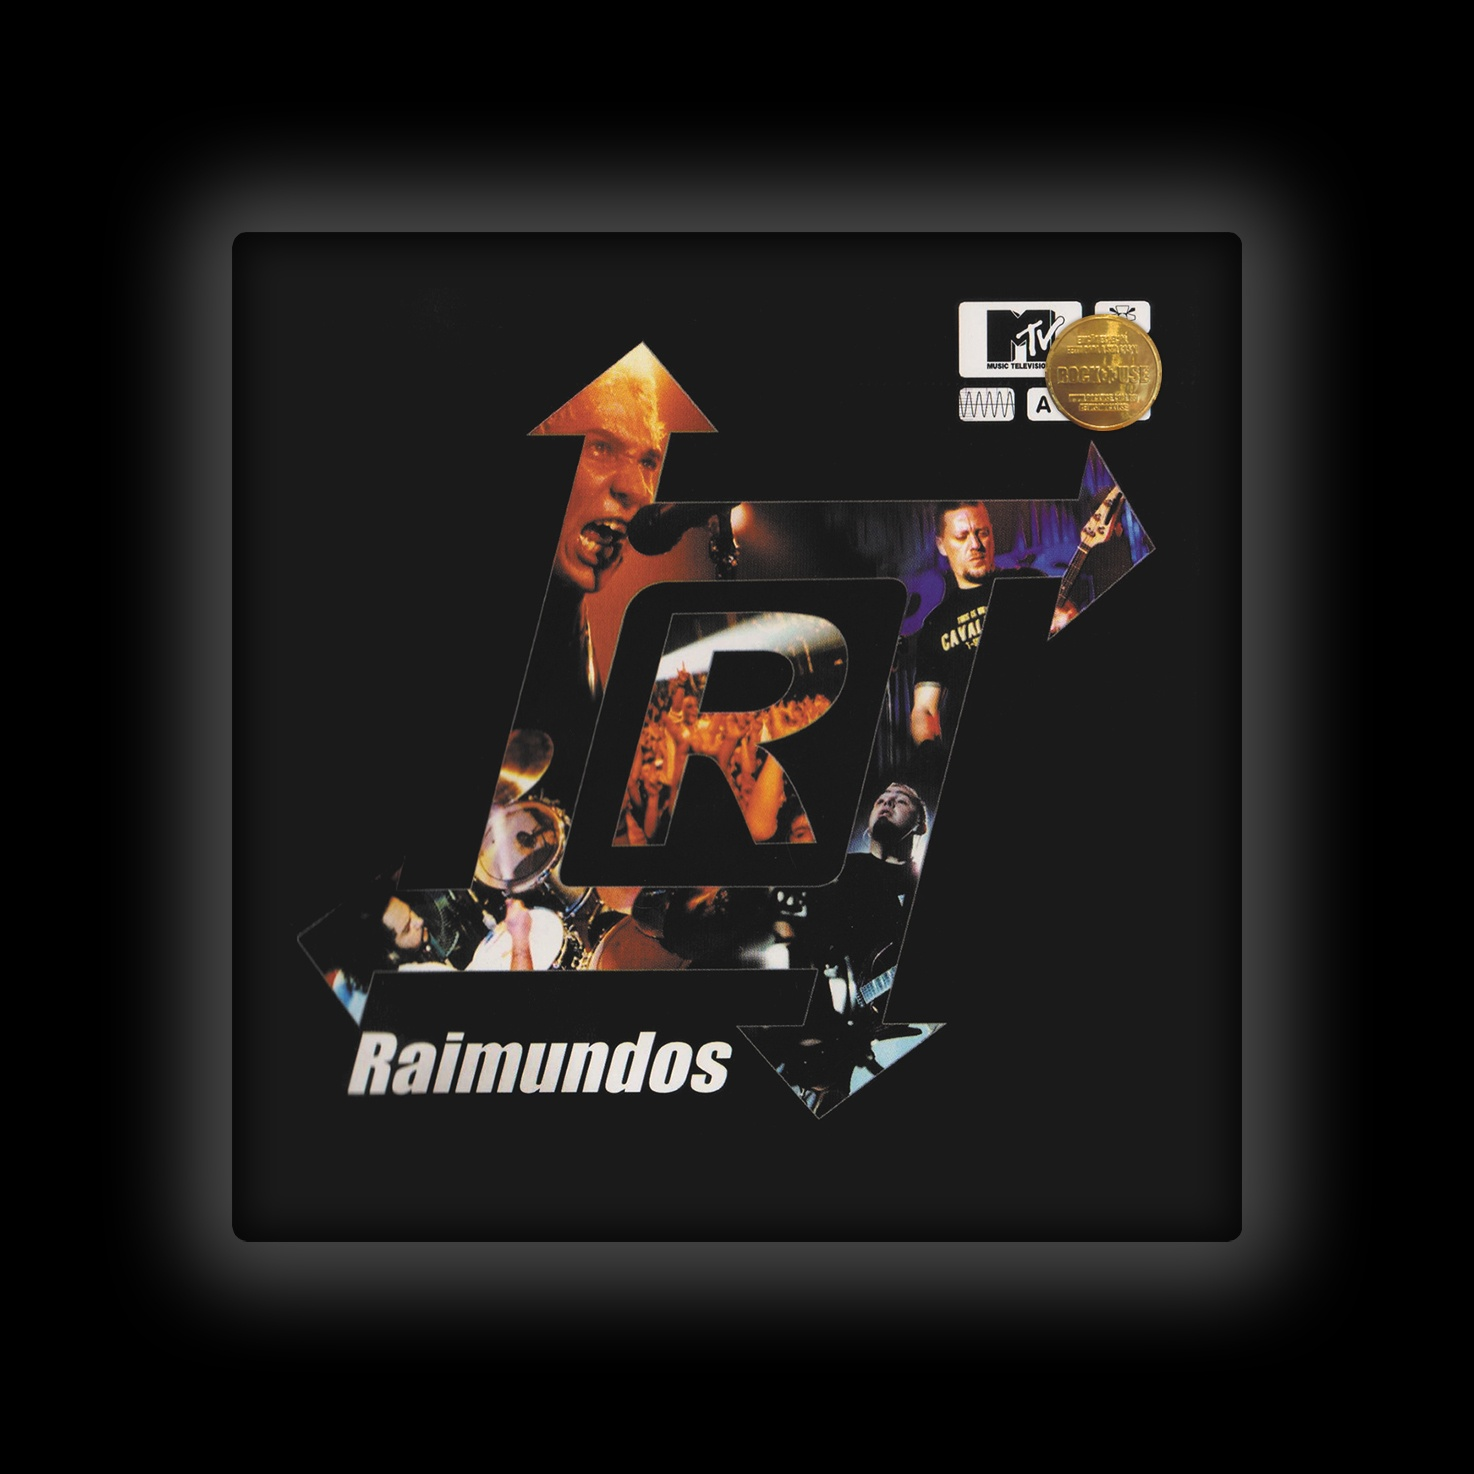 Capa de Almofada Raimundos - MTV Ao Vivo